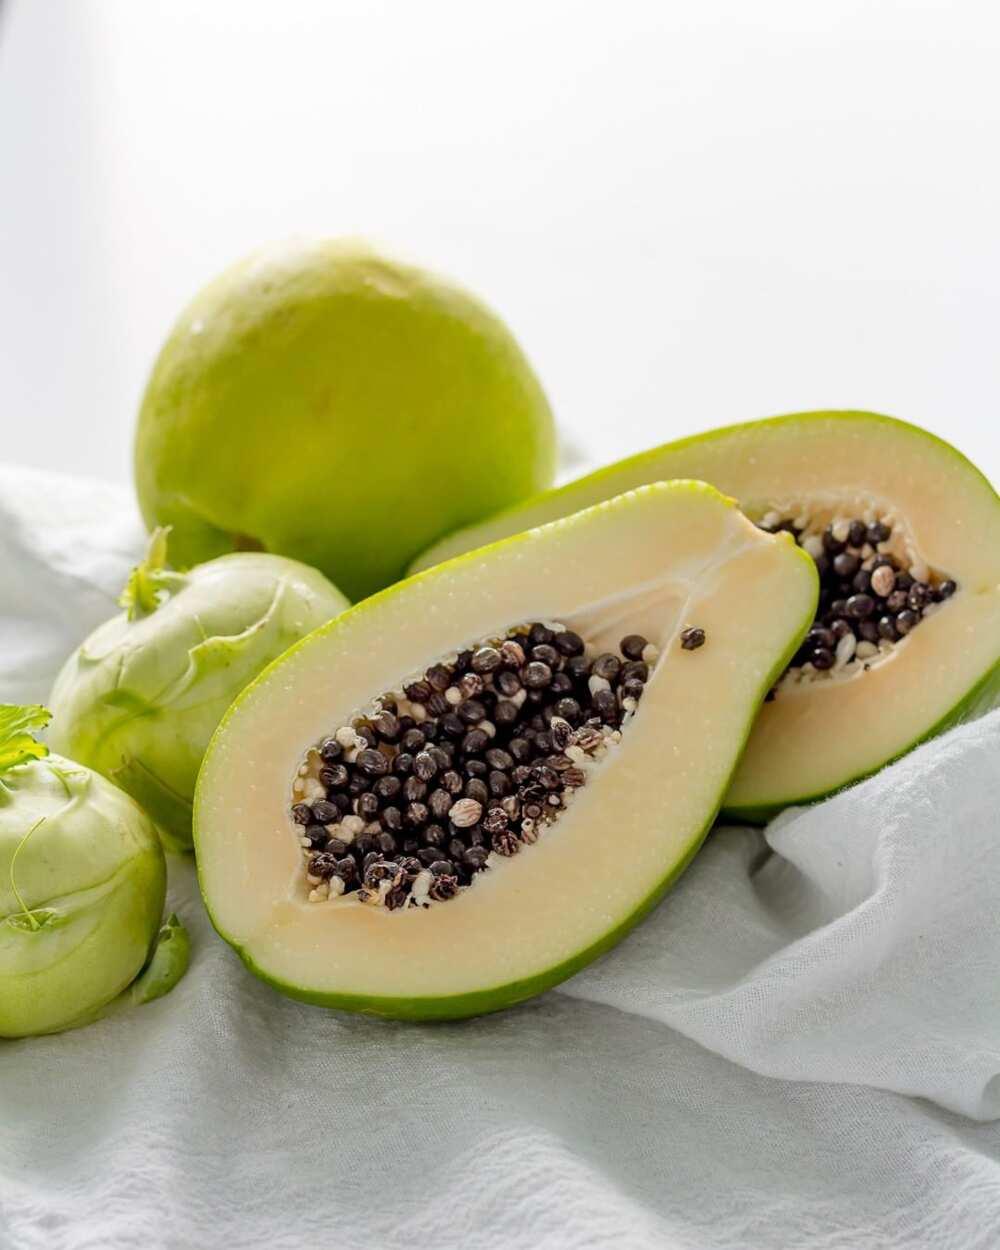 Pawpaw fruit health benefits